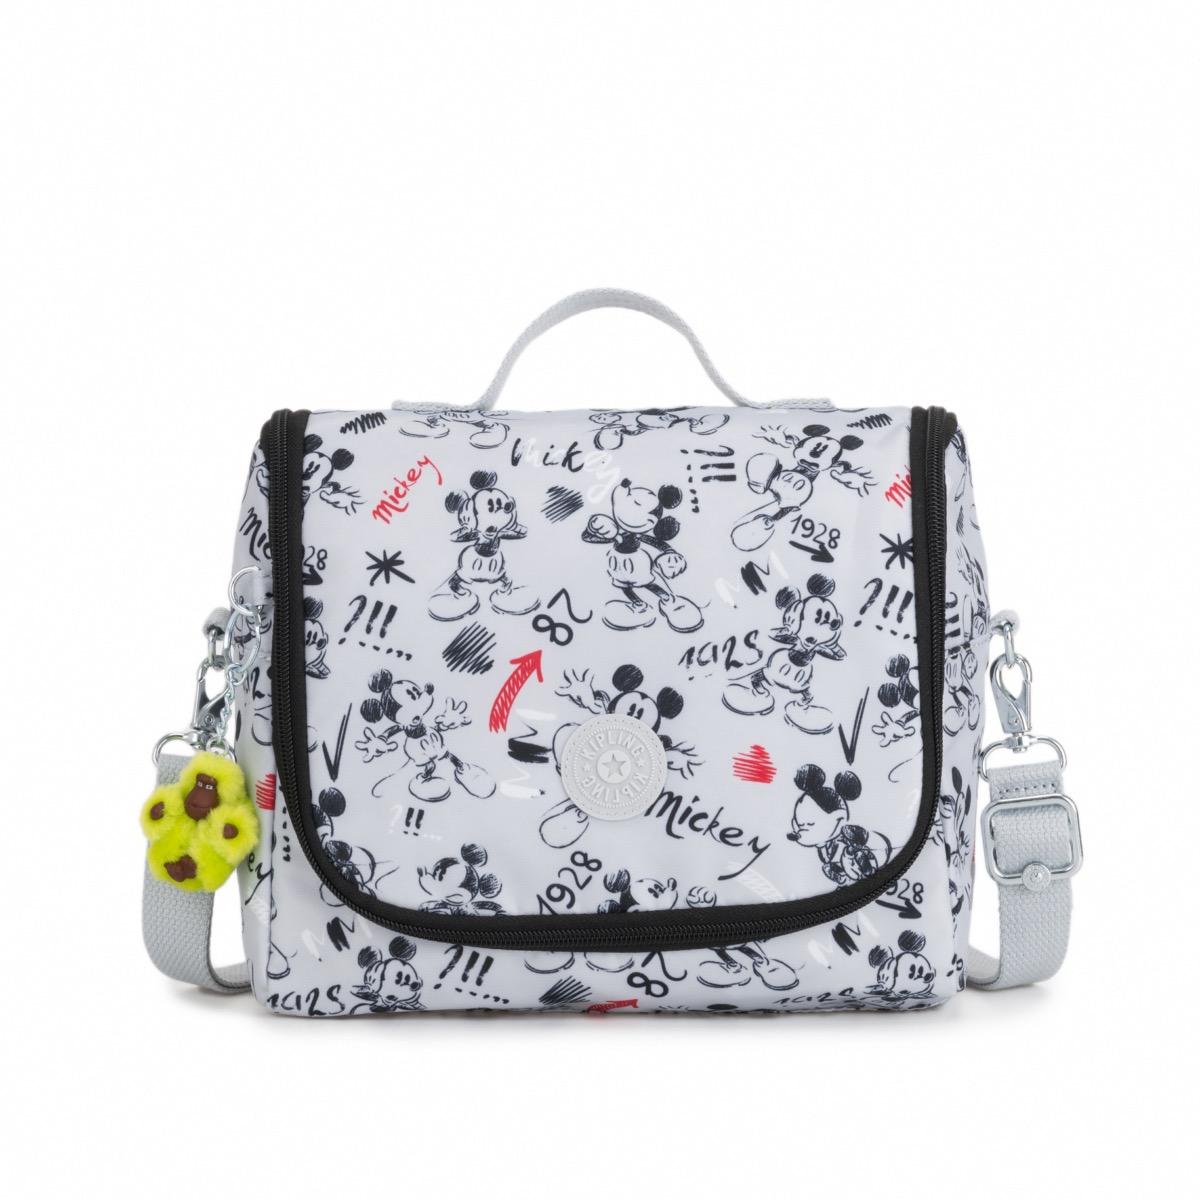 9e1c70f08c6 Kipling Disney D Kichirou Insulated Lunchbag with Monkey Sketch Grey Mickey  Mouse